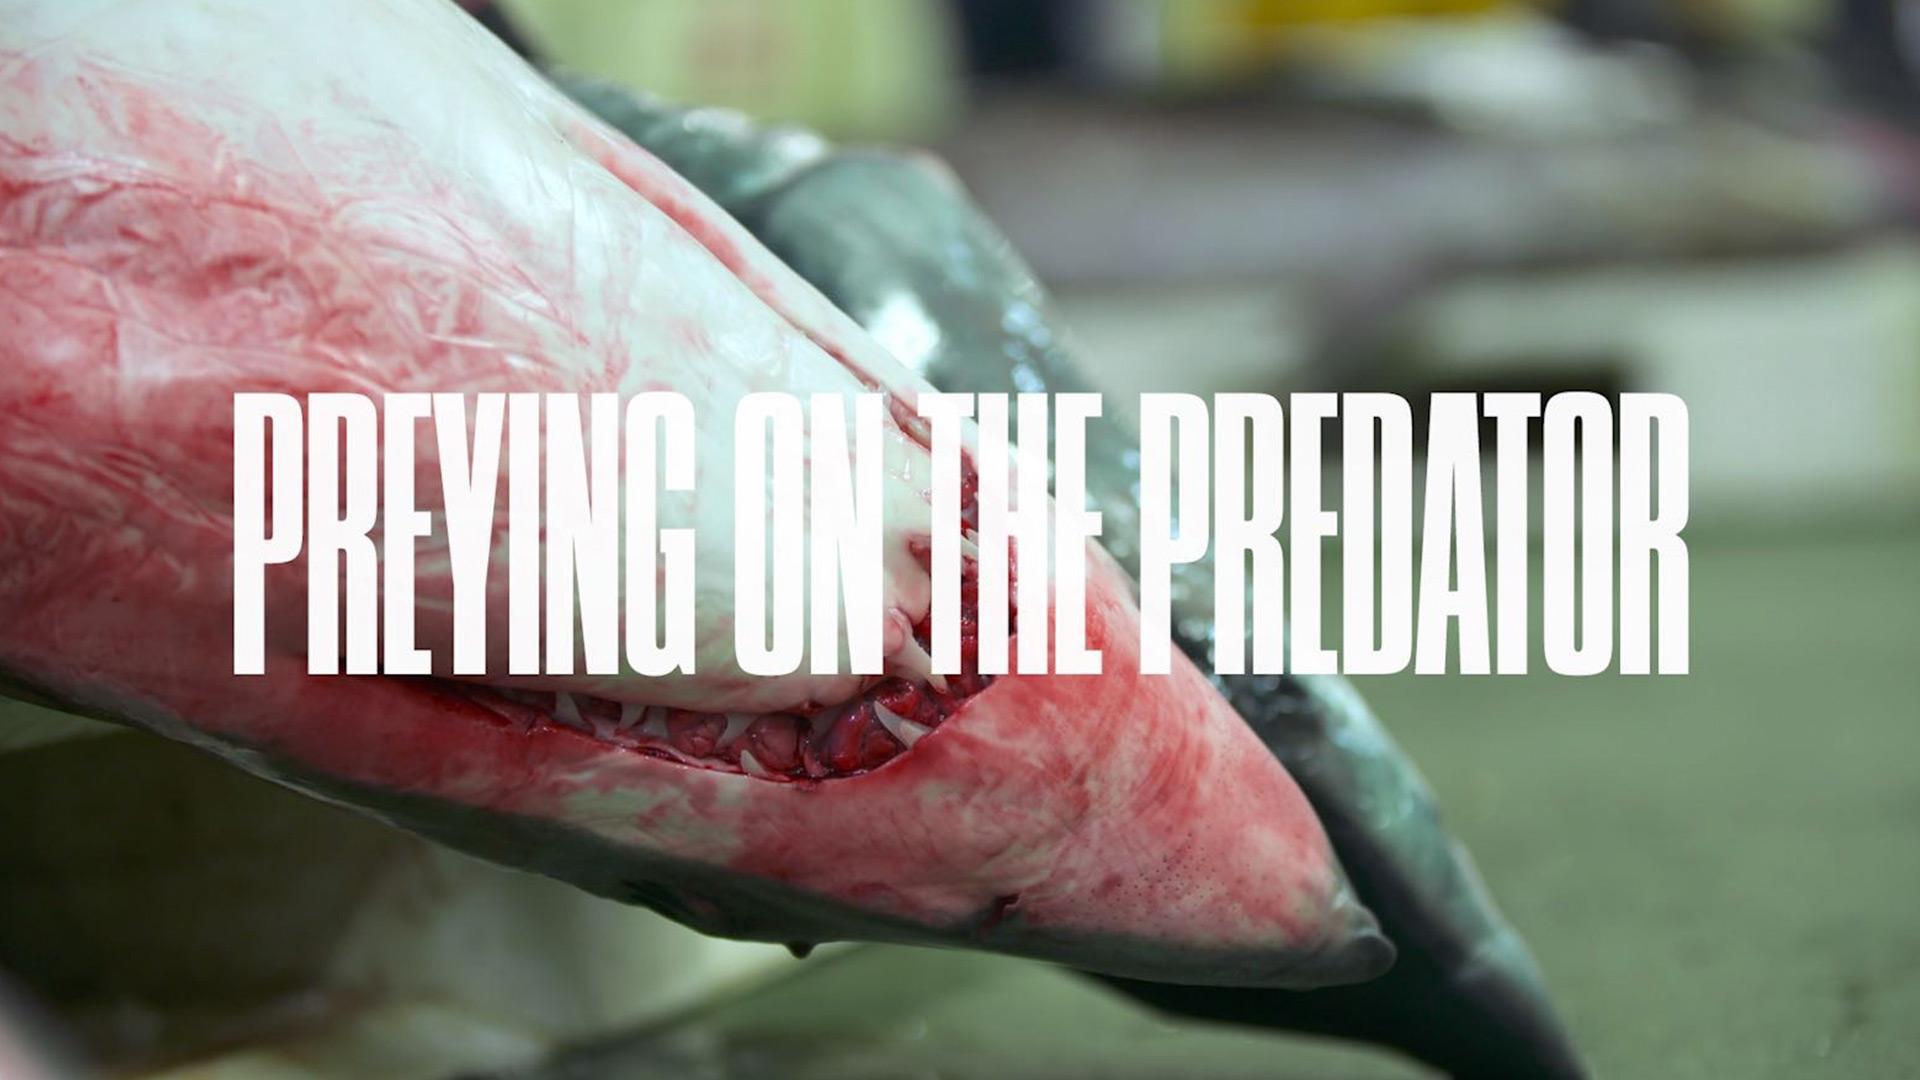 Preying on the predator